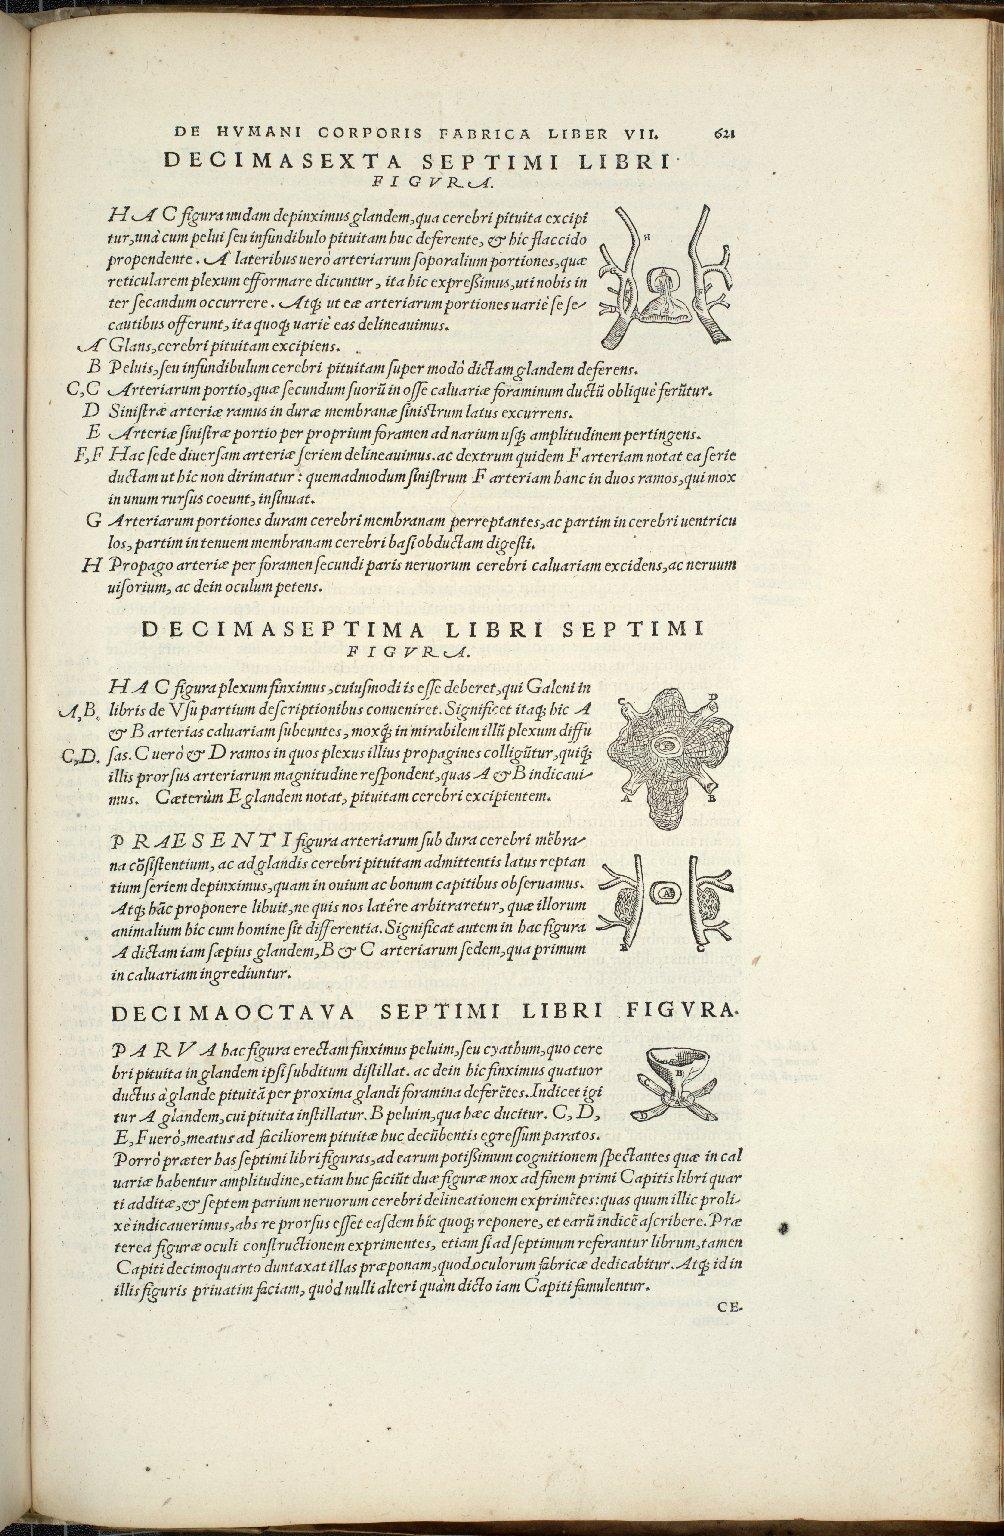 Decimasexta, Decimaseptima, Decimaoctava Septimi Libri Figura